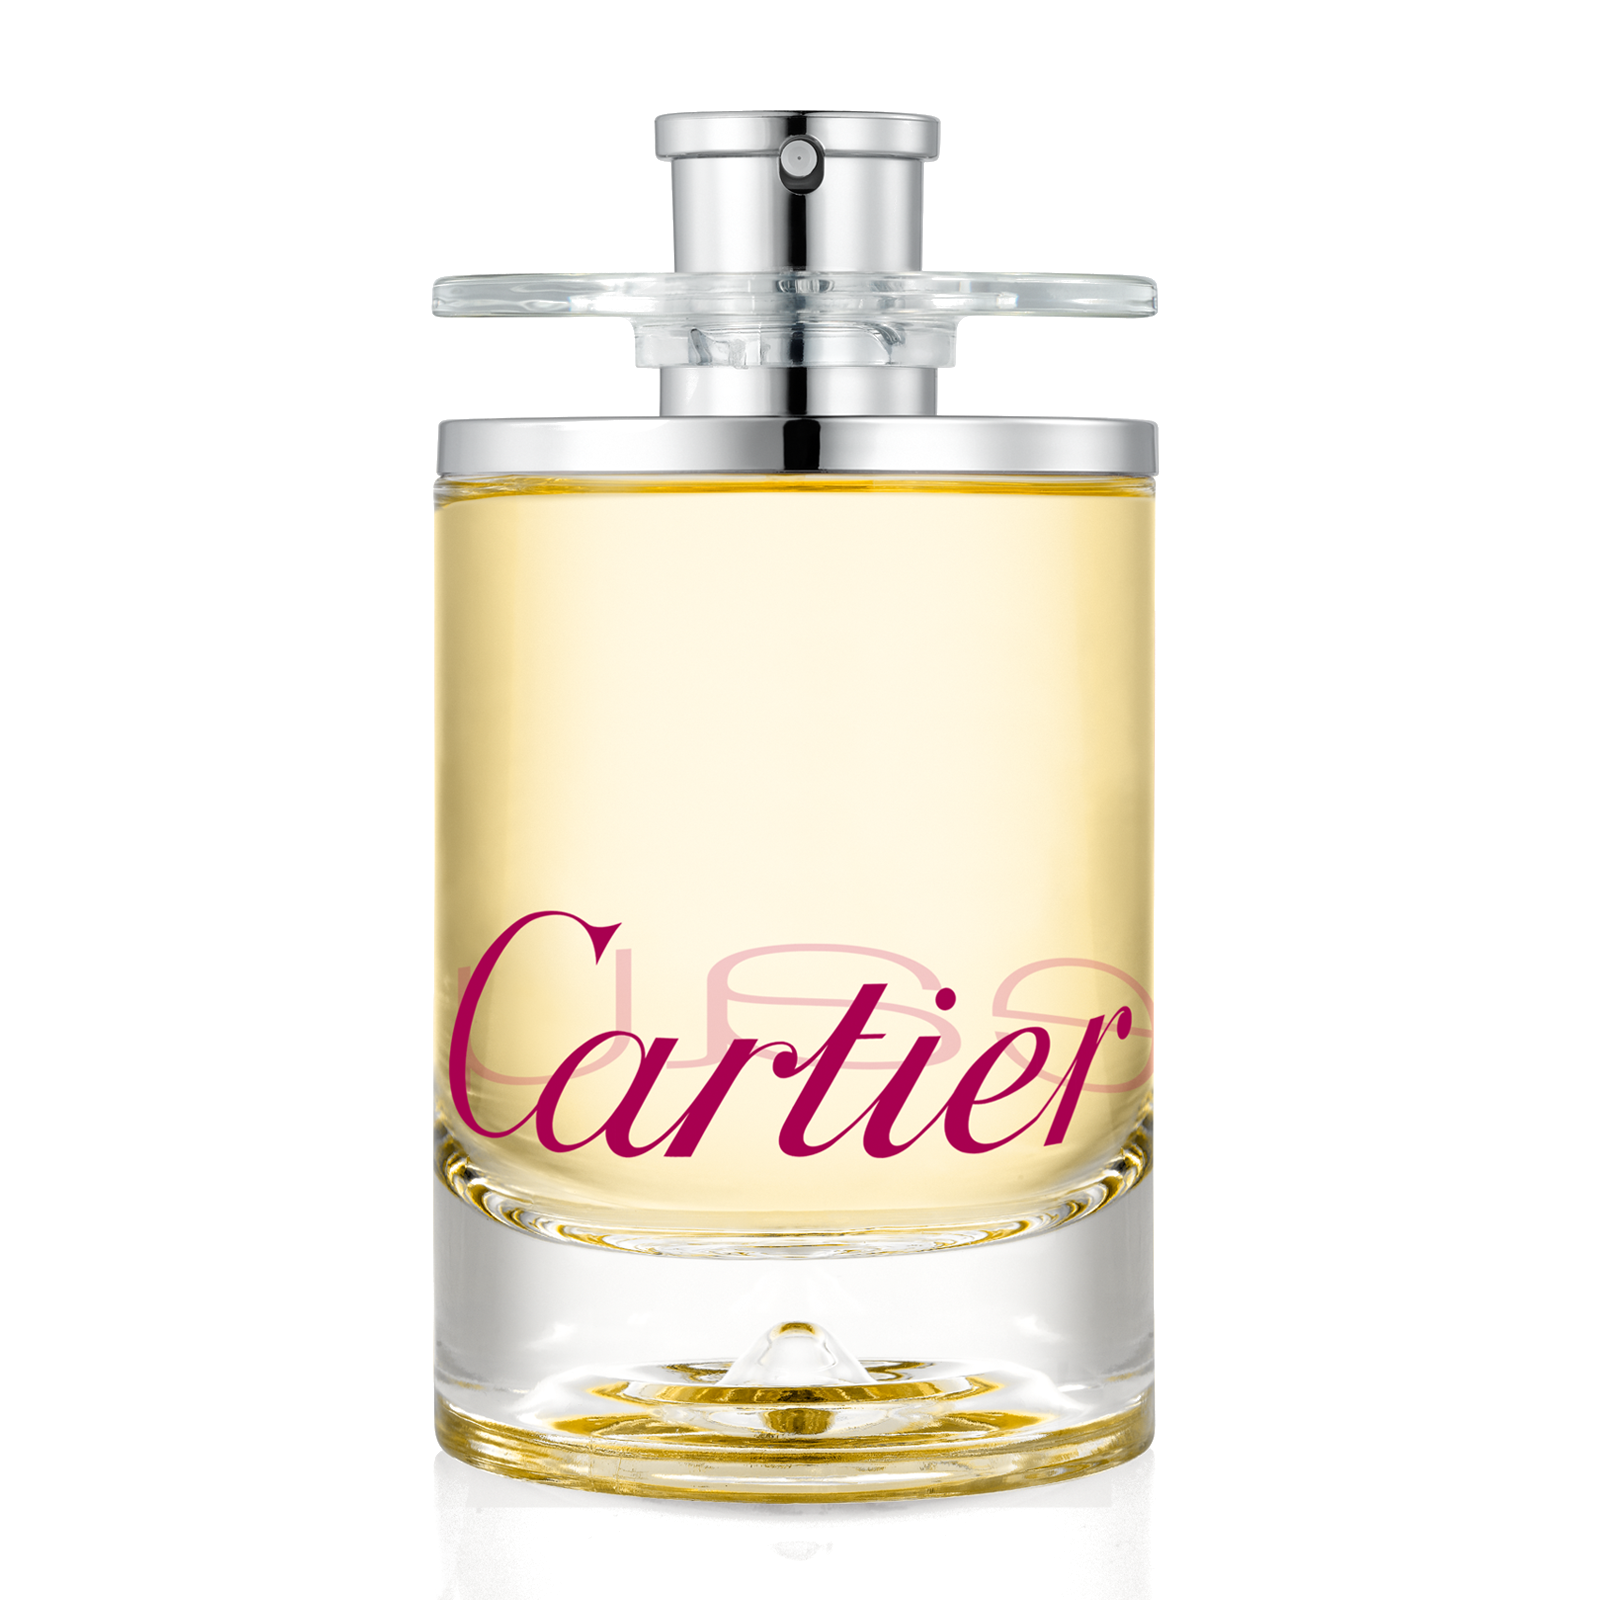 CARTIER - ZESTE DE SOLEIL EDT 100 ML